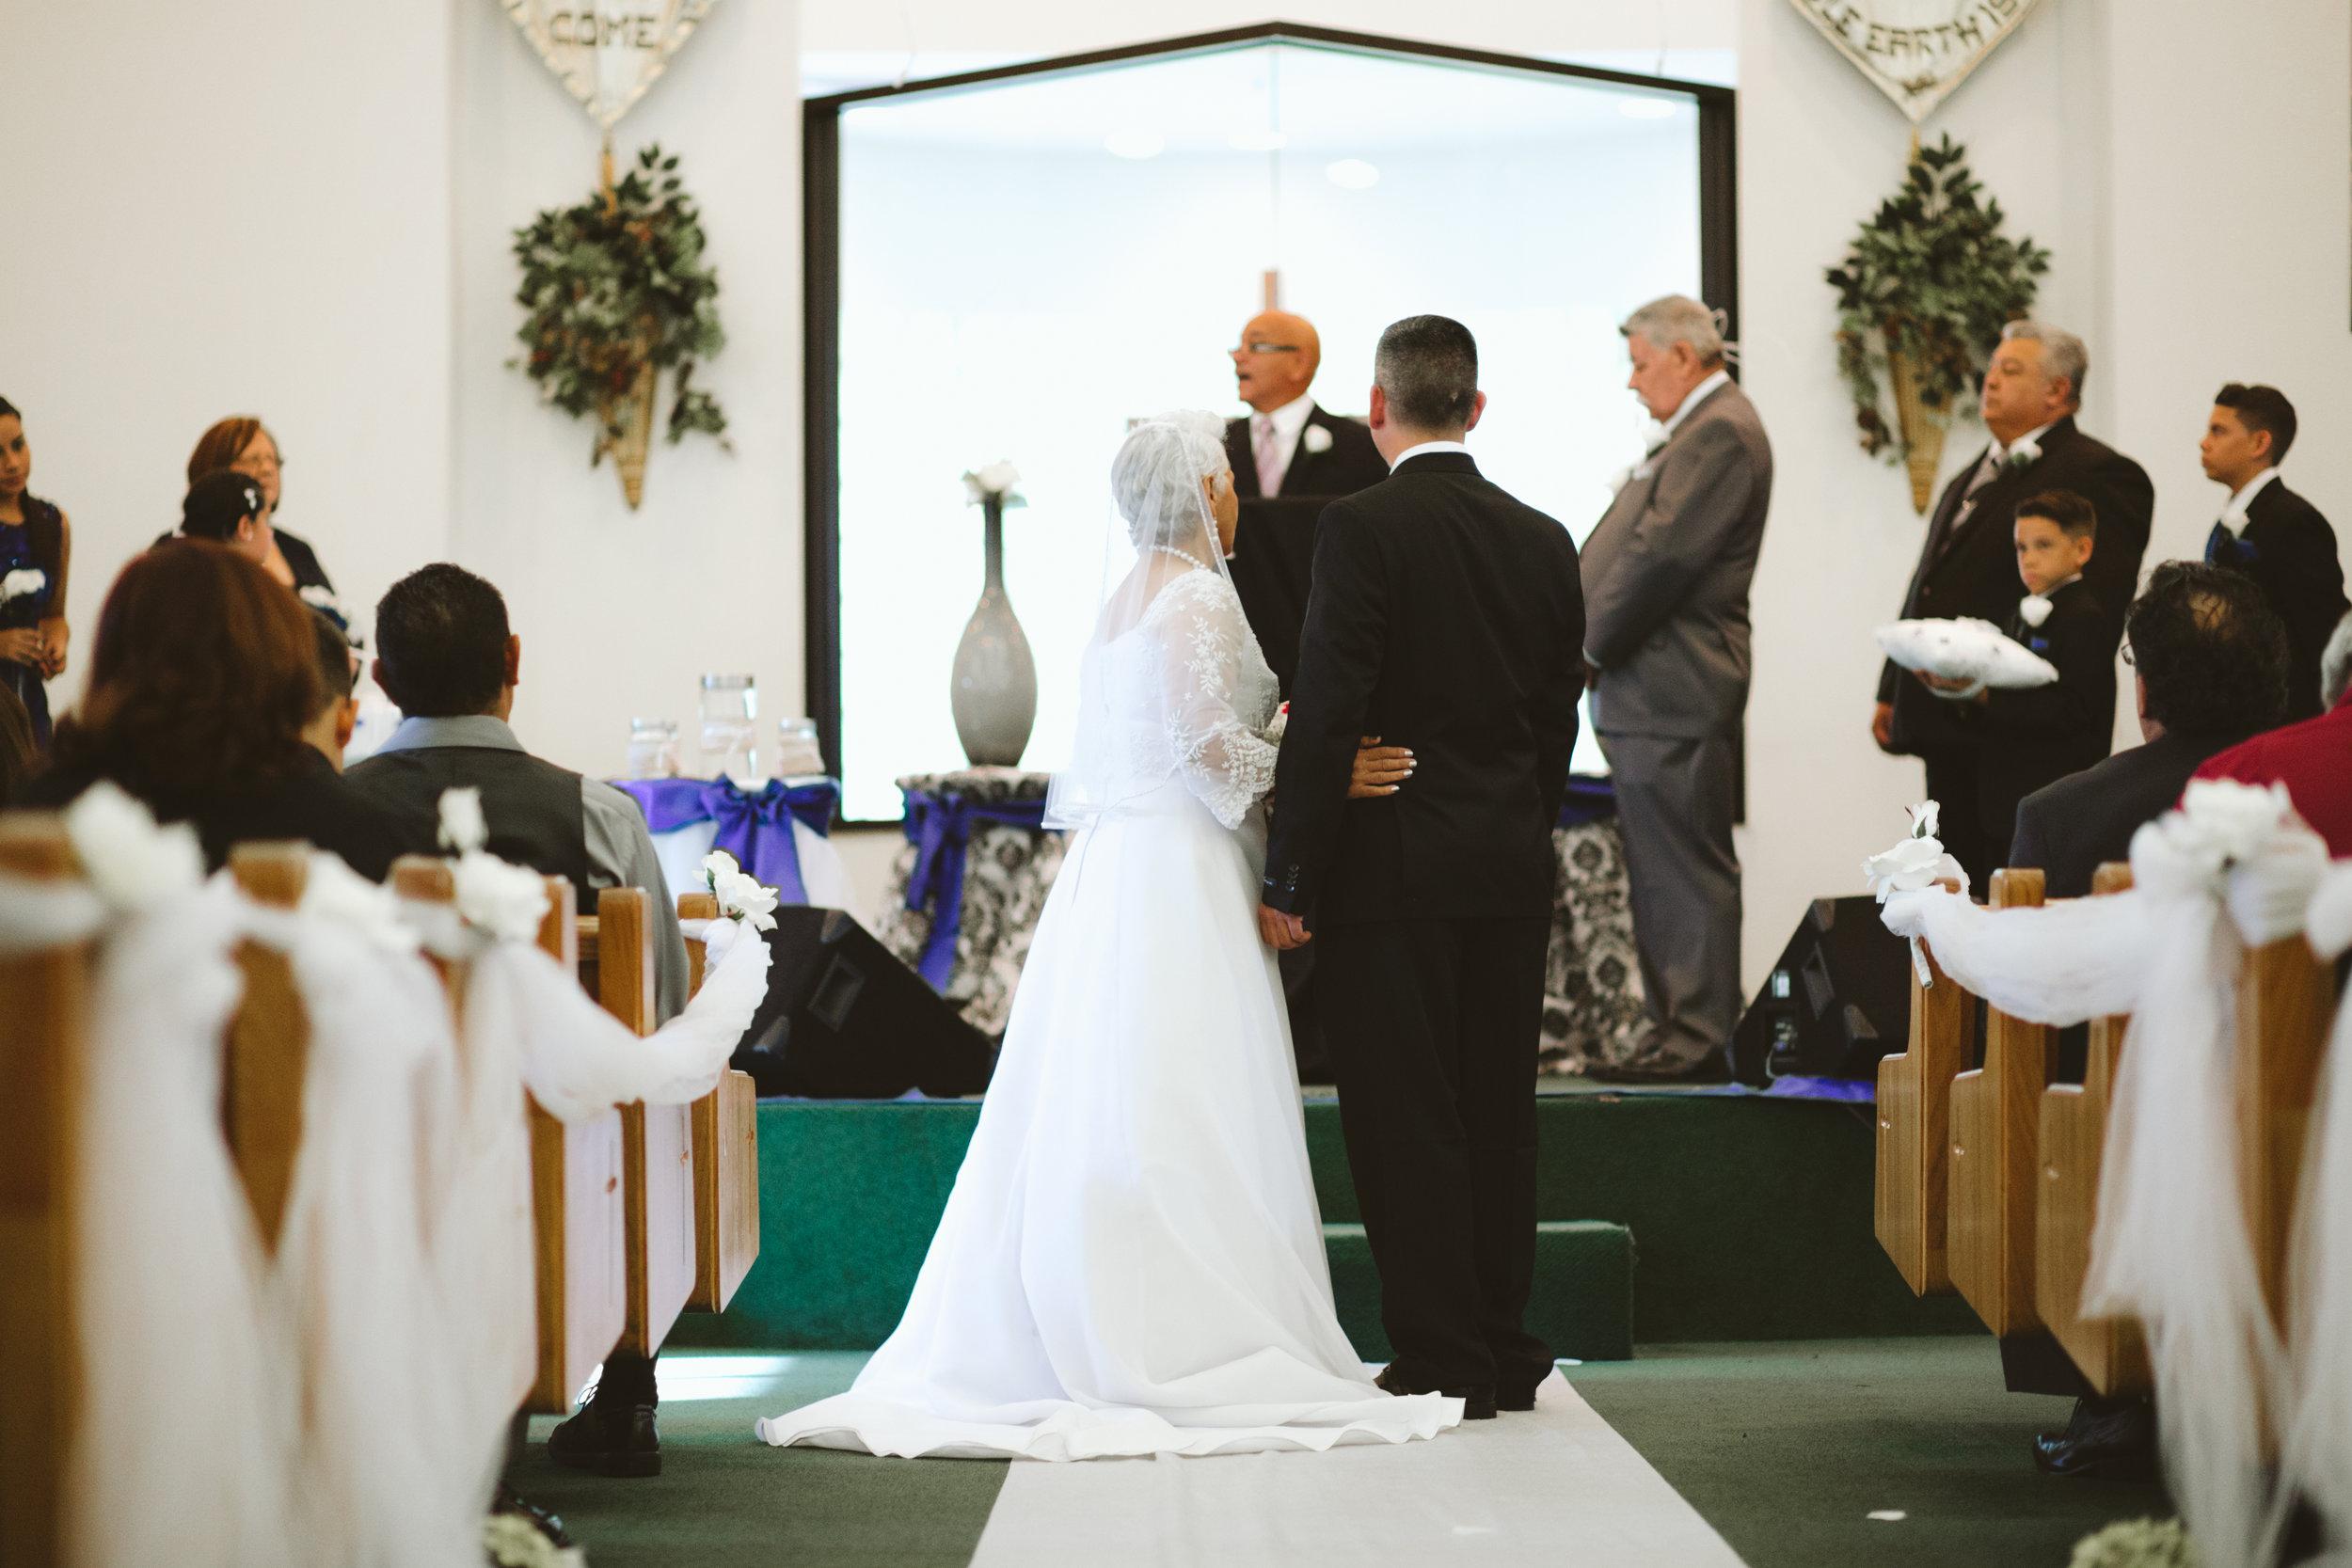 wedding | Vanessa Boy Photography | vanessaboy.com |-115.jpg